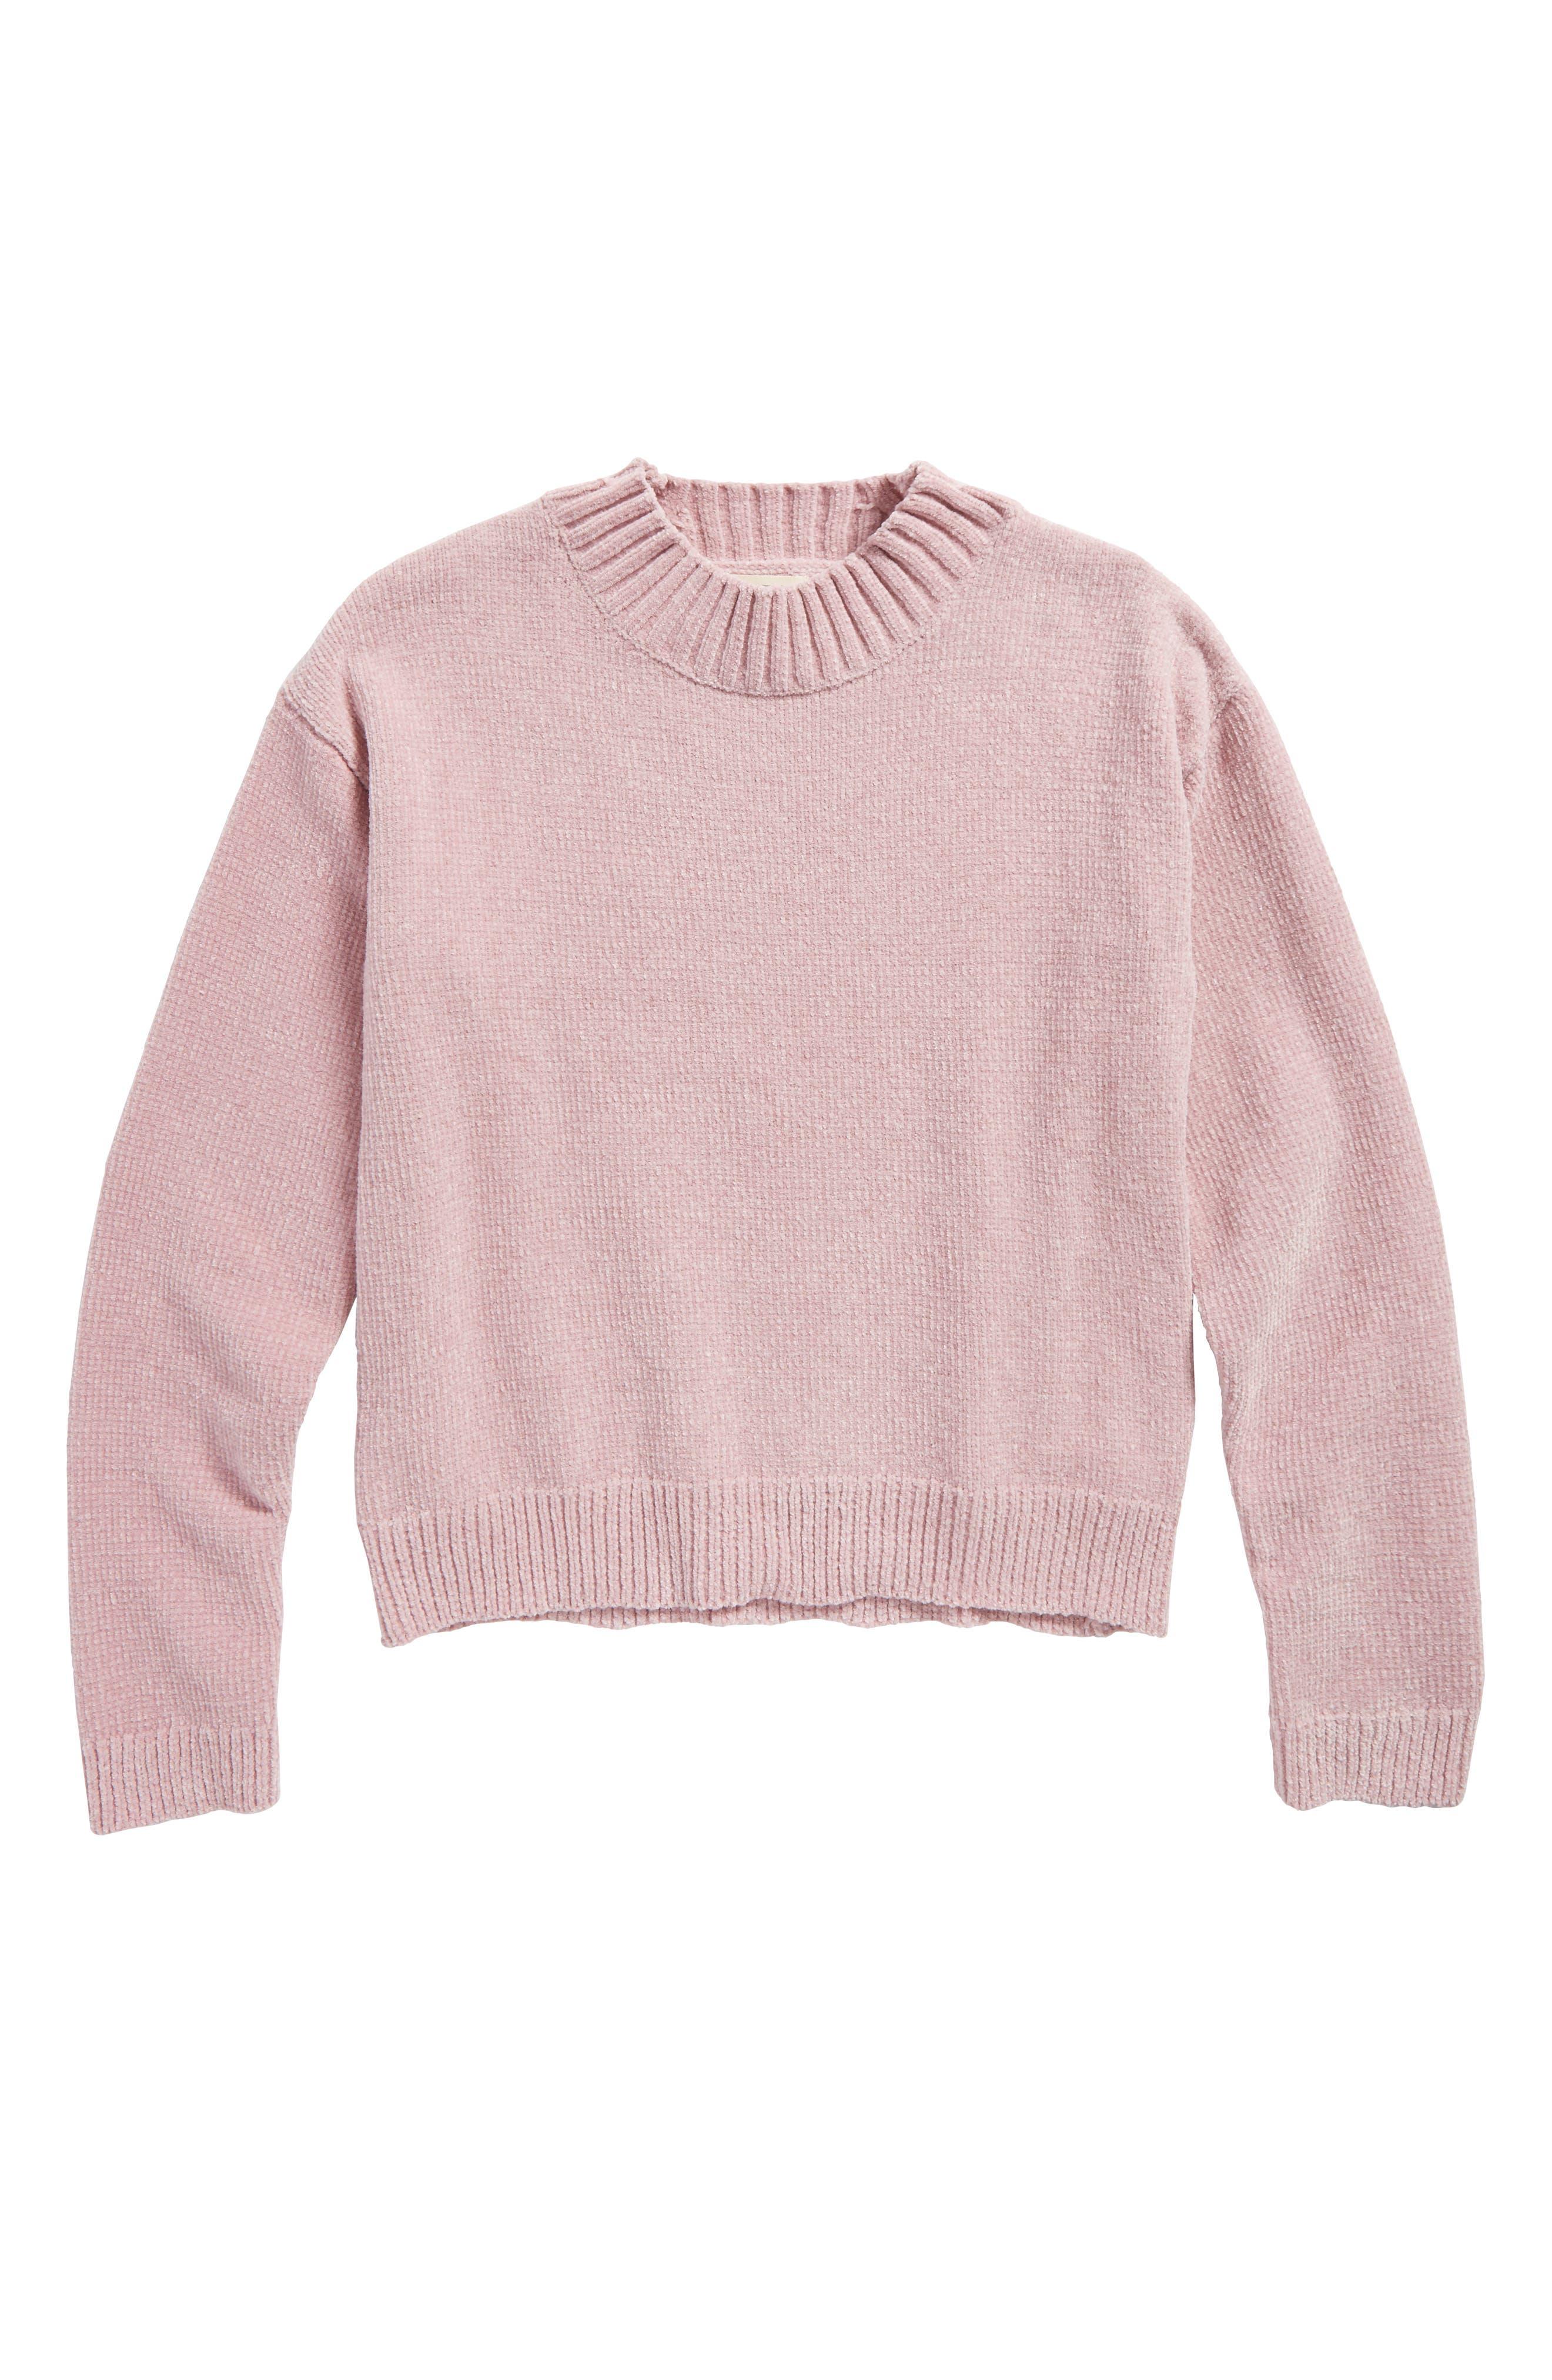 Alternate Image 1 Selected - Tucker + Tate Chenille Mock Neck Sweater (Big Girls)